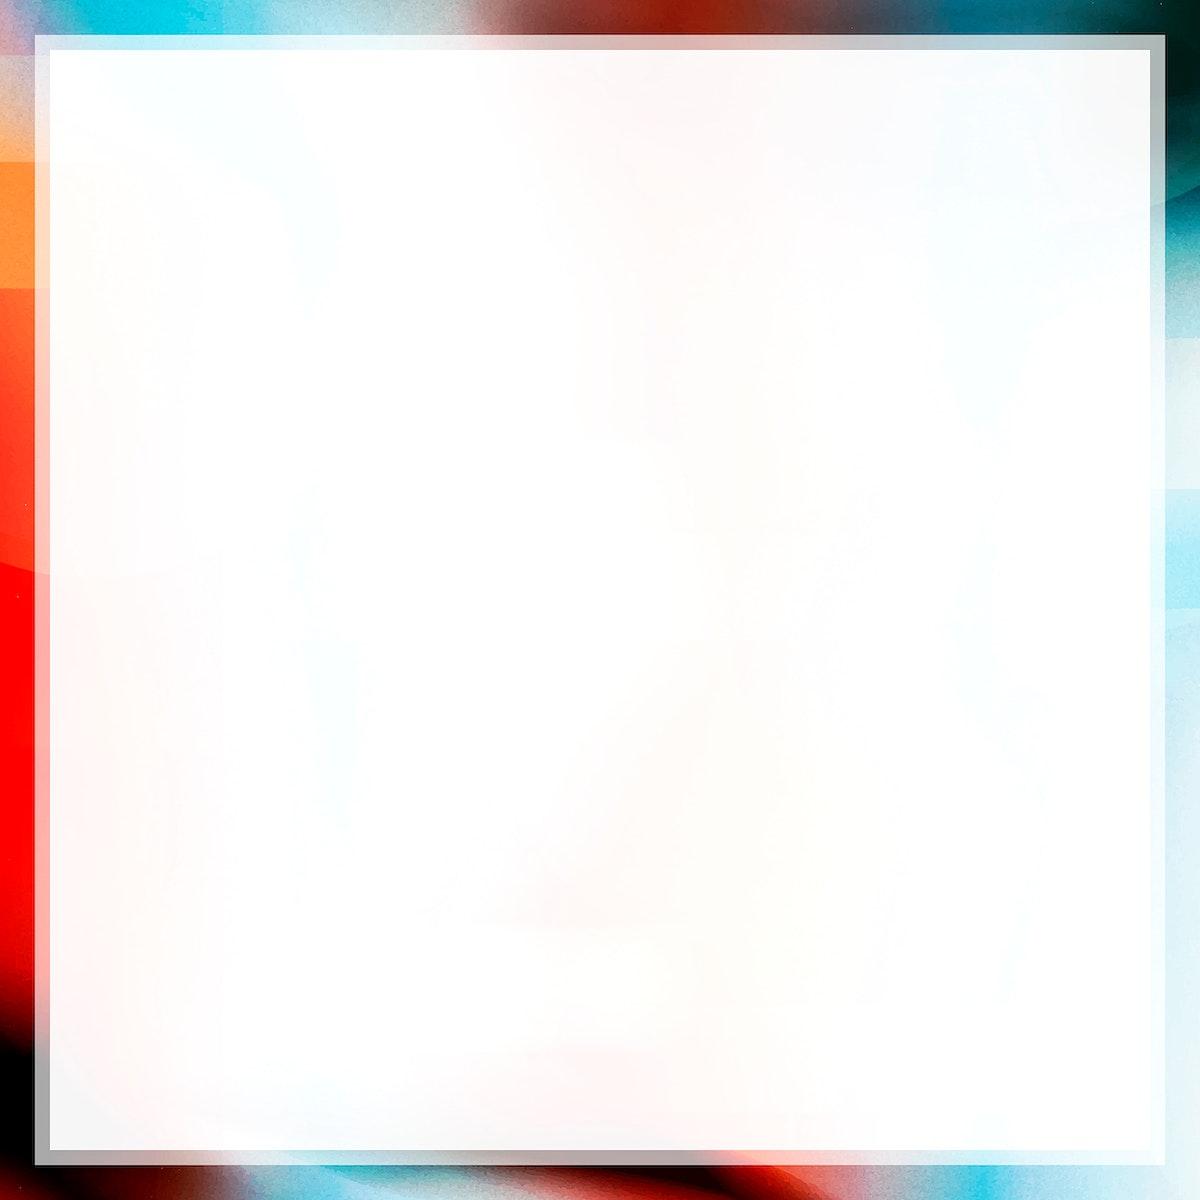 Colorful glitch frame vector